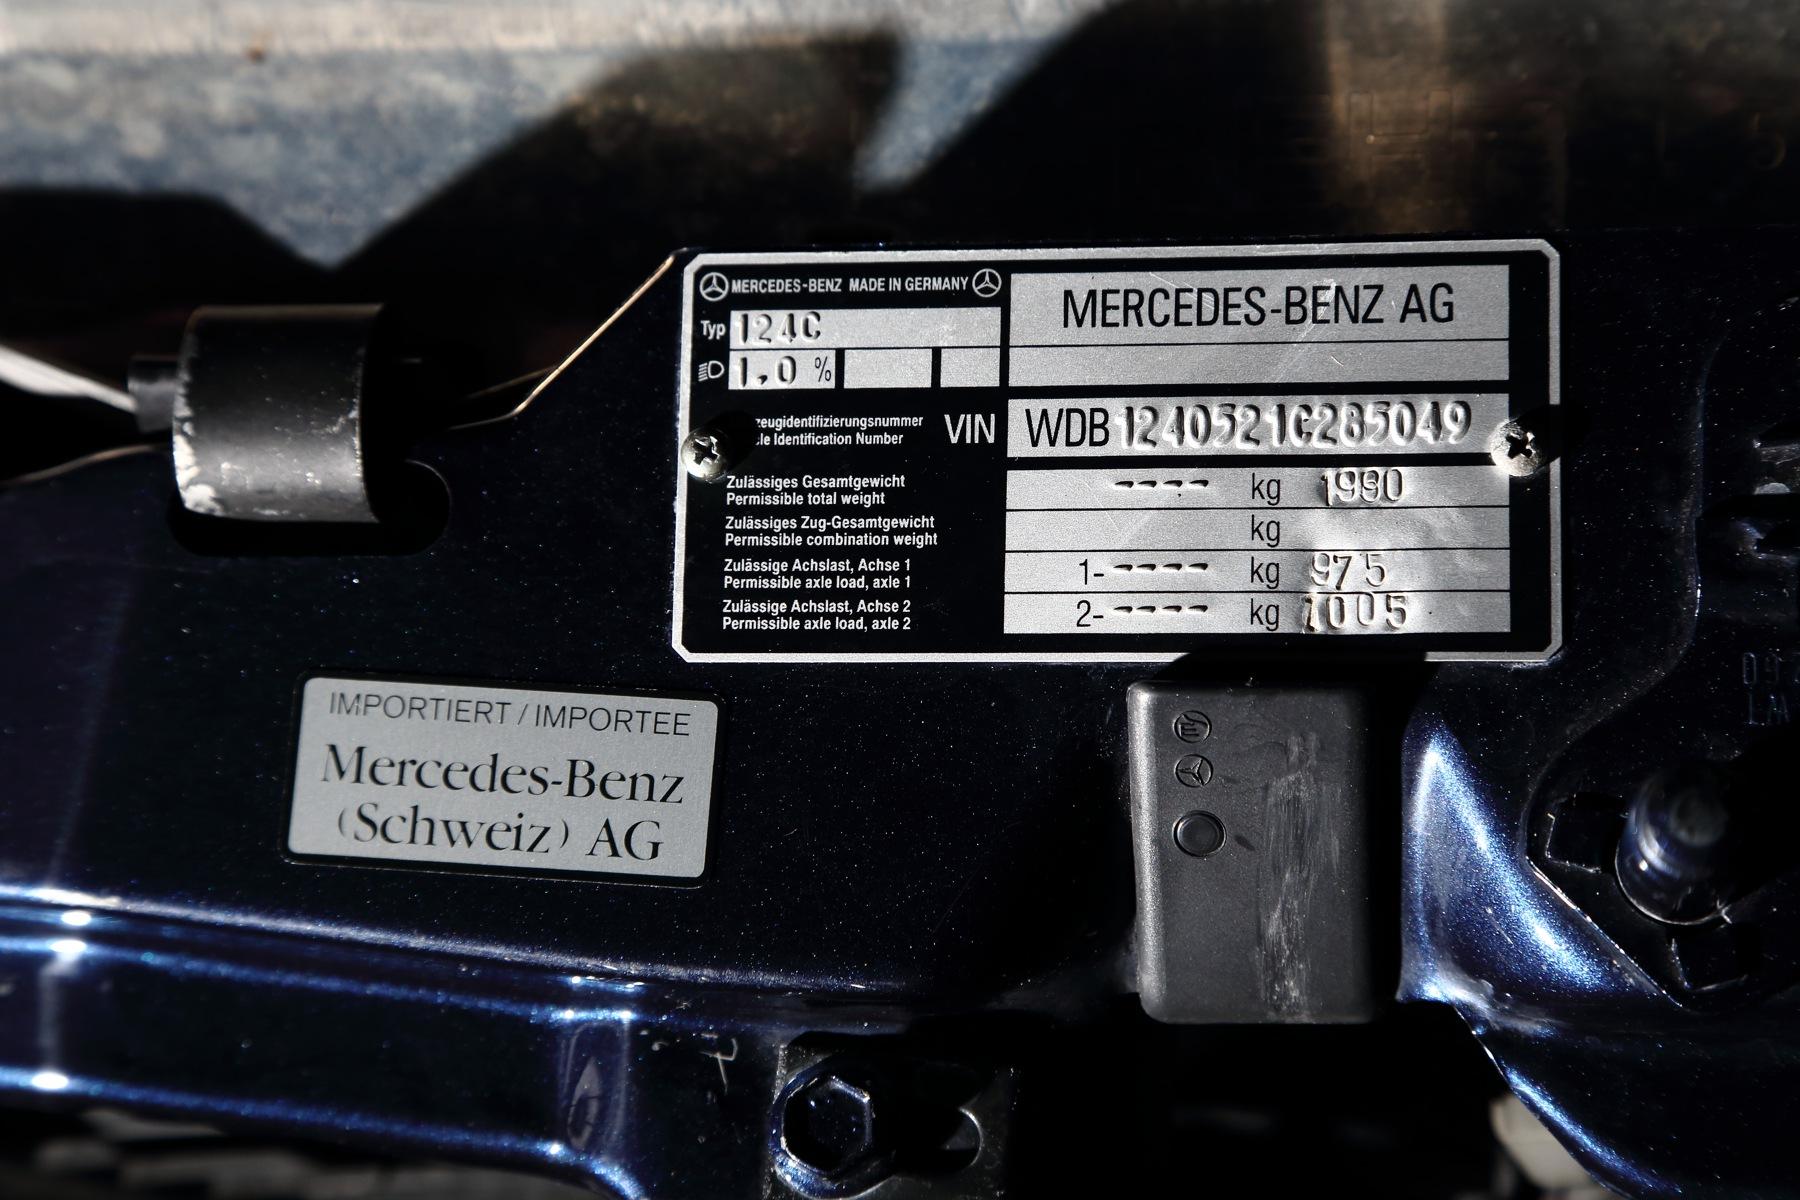 020 2016_03_24_Mercedes 320 E 069